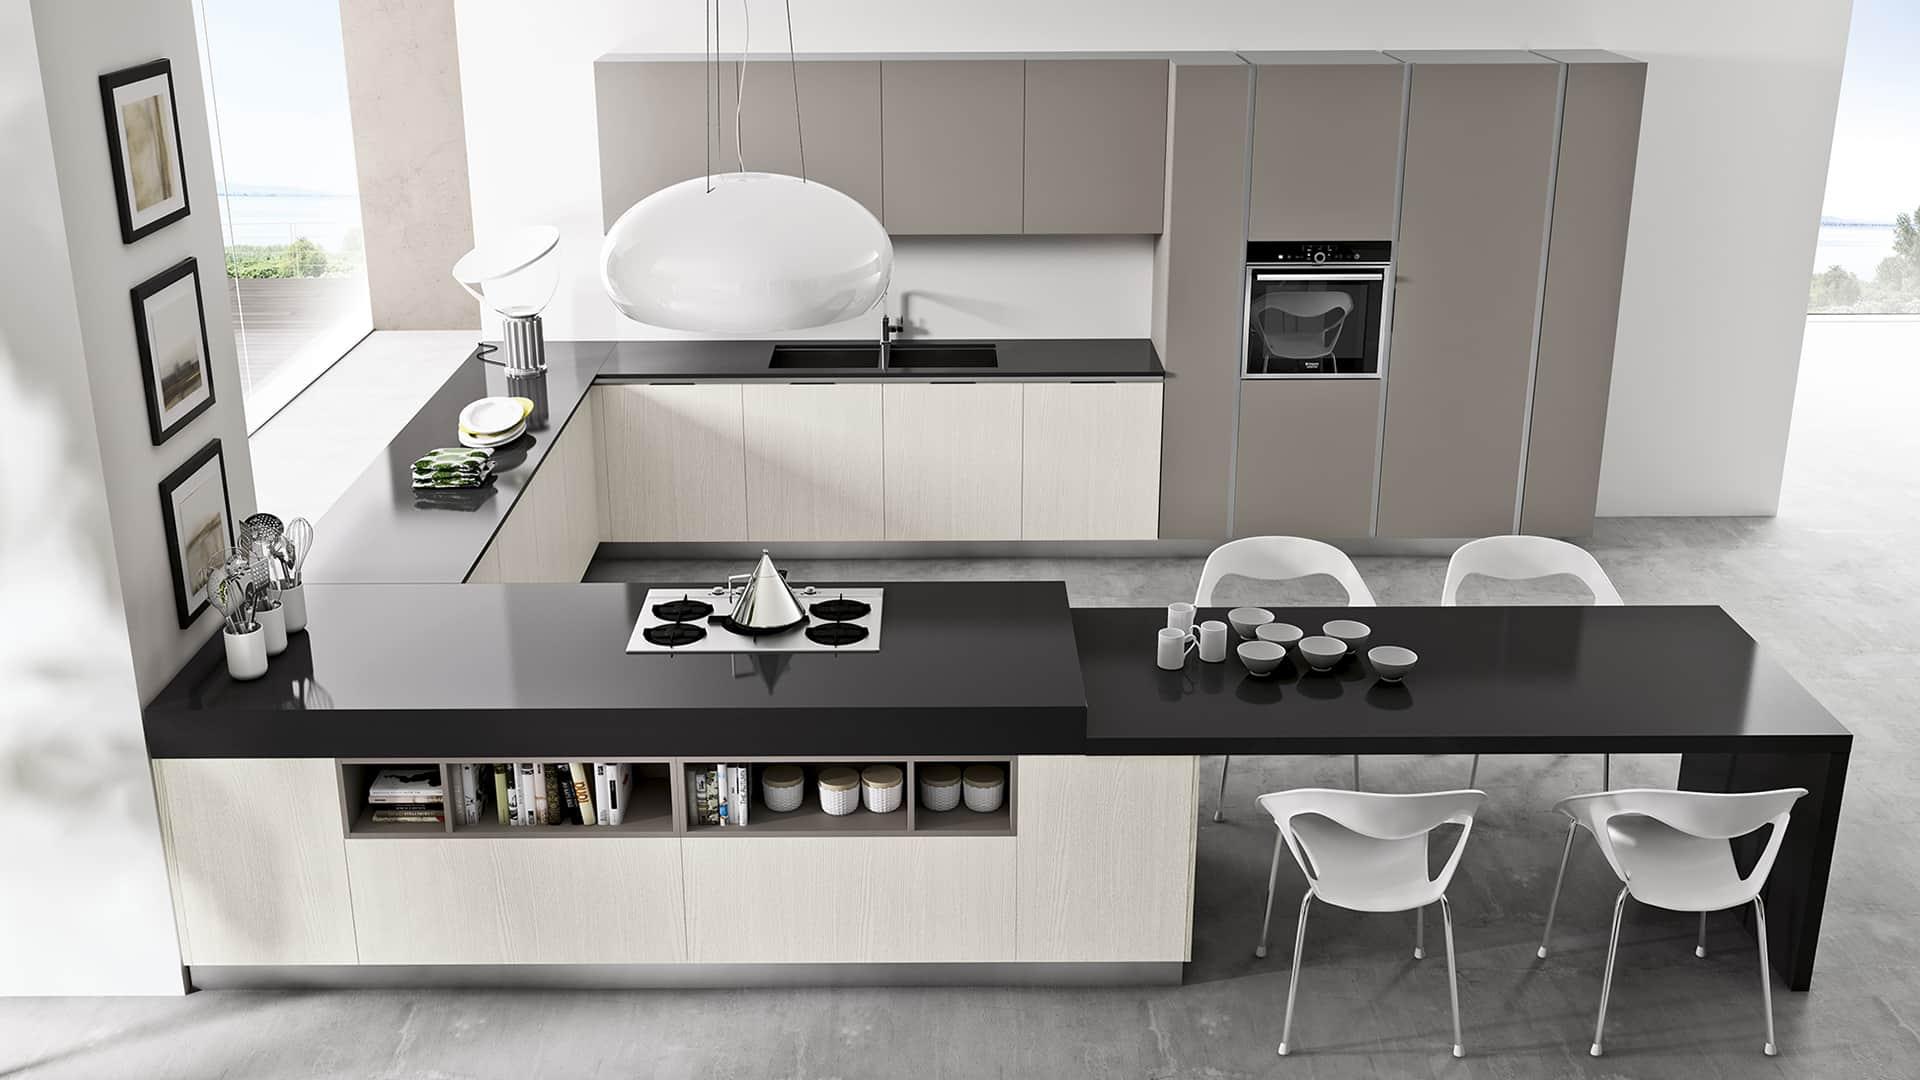 Cucine angolari moderne a padova - Cucina moderna con penisola ...